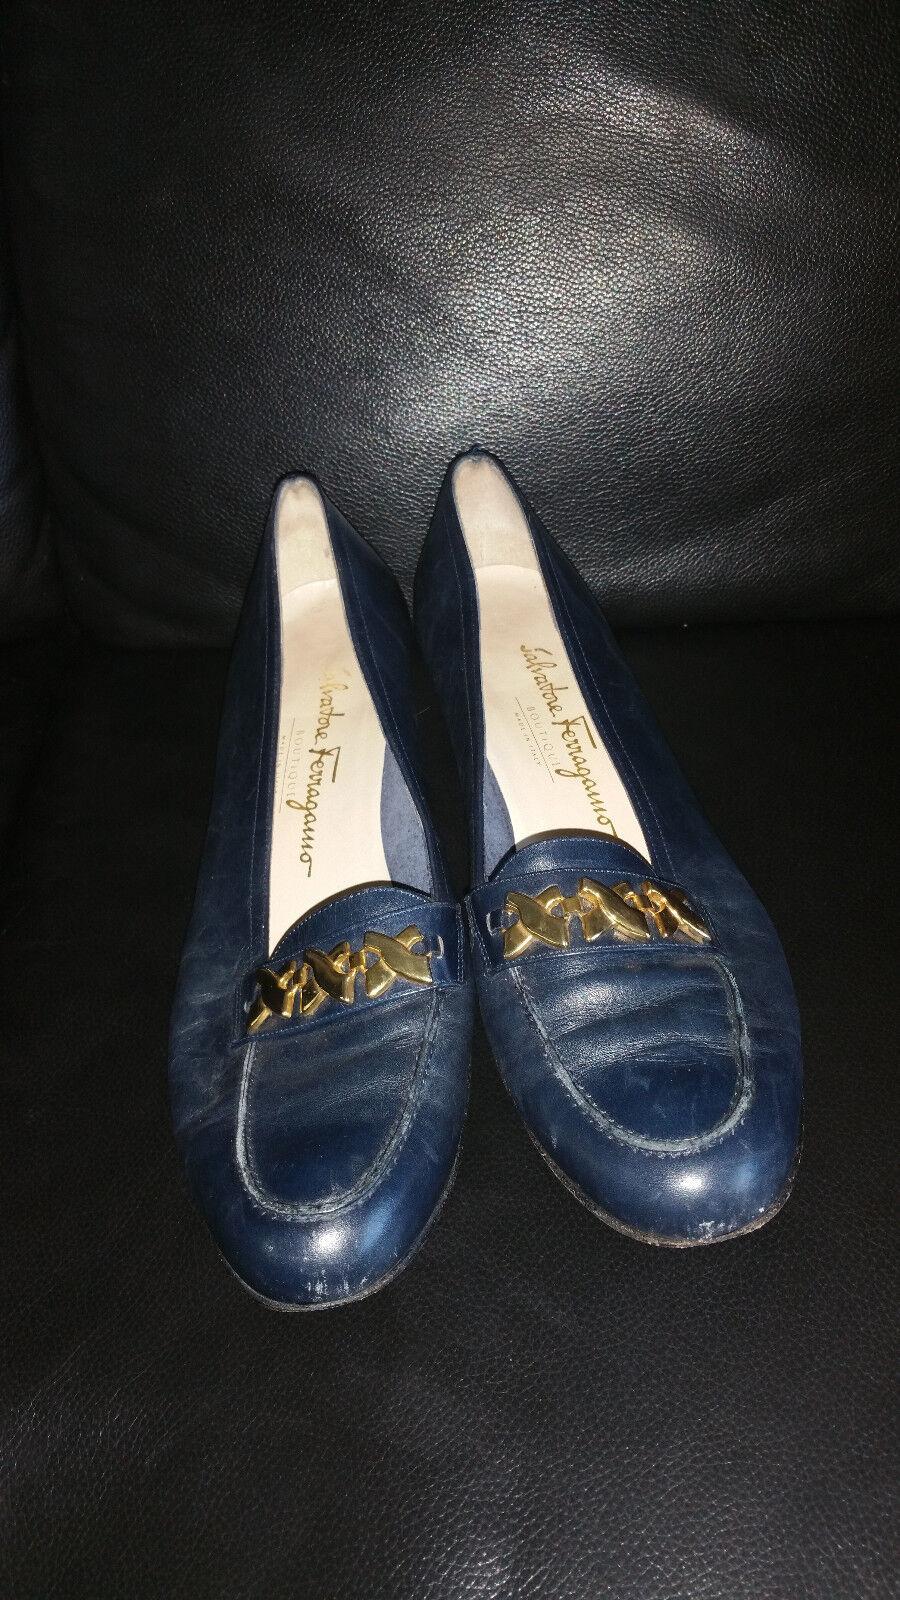 Vintage Salvatore Ferragamo Women's Blue Leather Loafers Size 9 A 628 24365